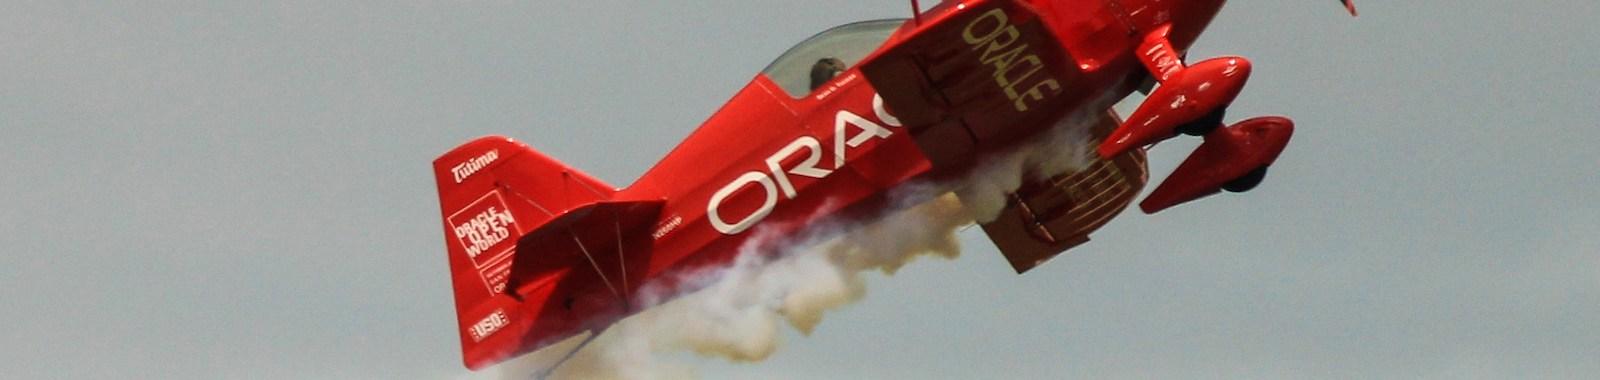 Team Oracle biplane in Dayton Airshow 2015